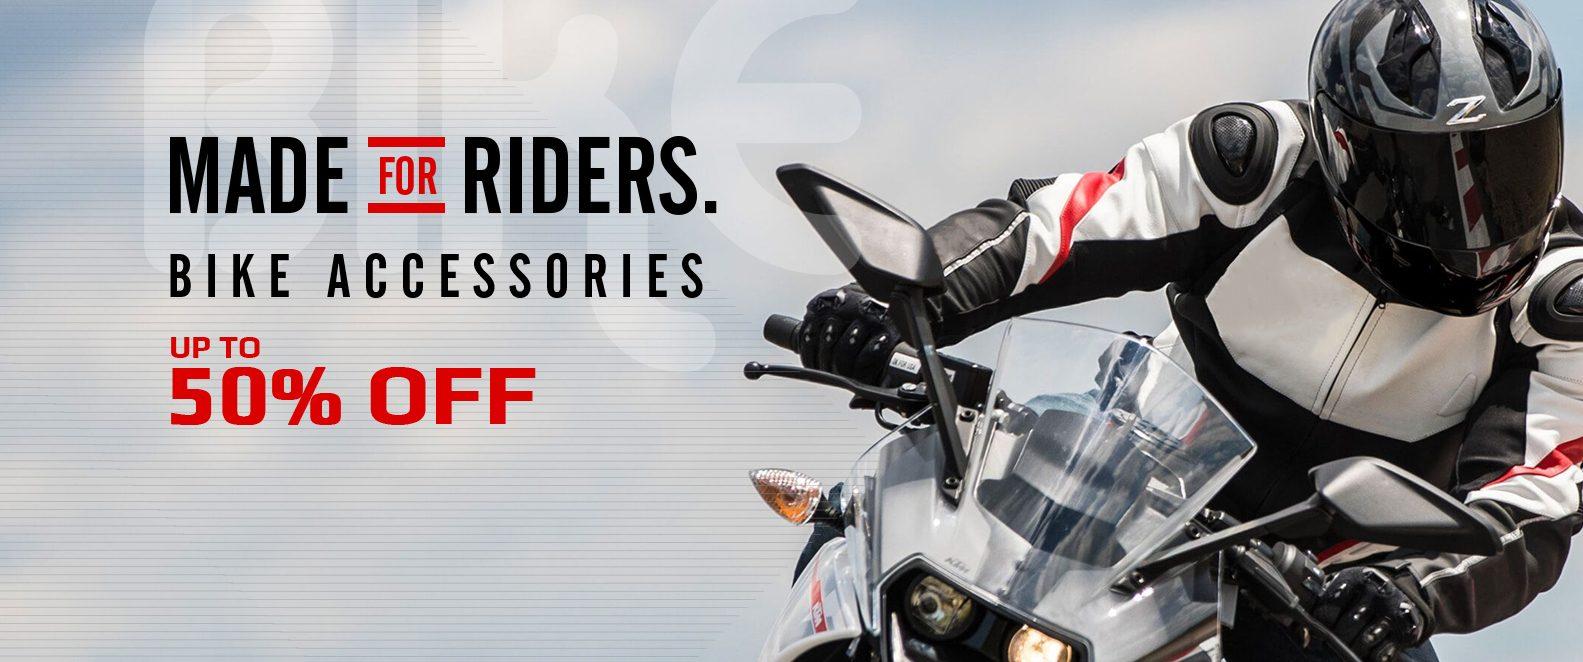 Best Riding Gear Online - Biker Accessories India